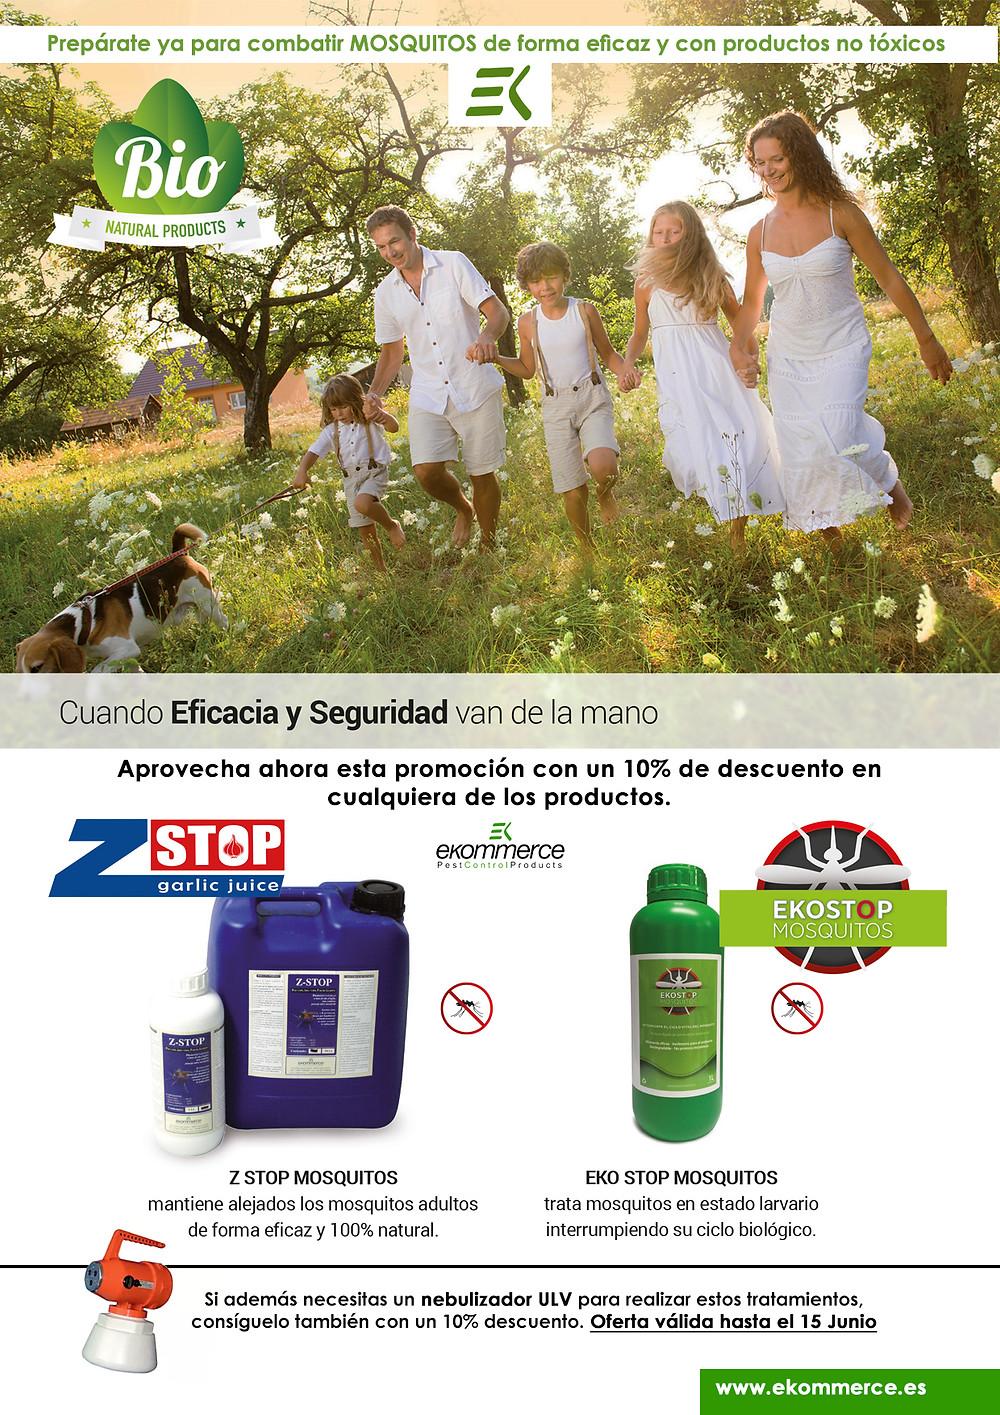 Ekostop Mosquitos y Z-Stop Garlic Juice